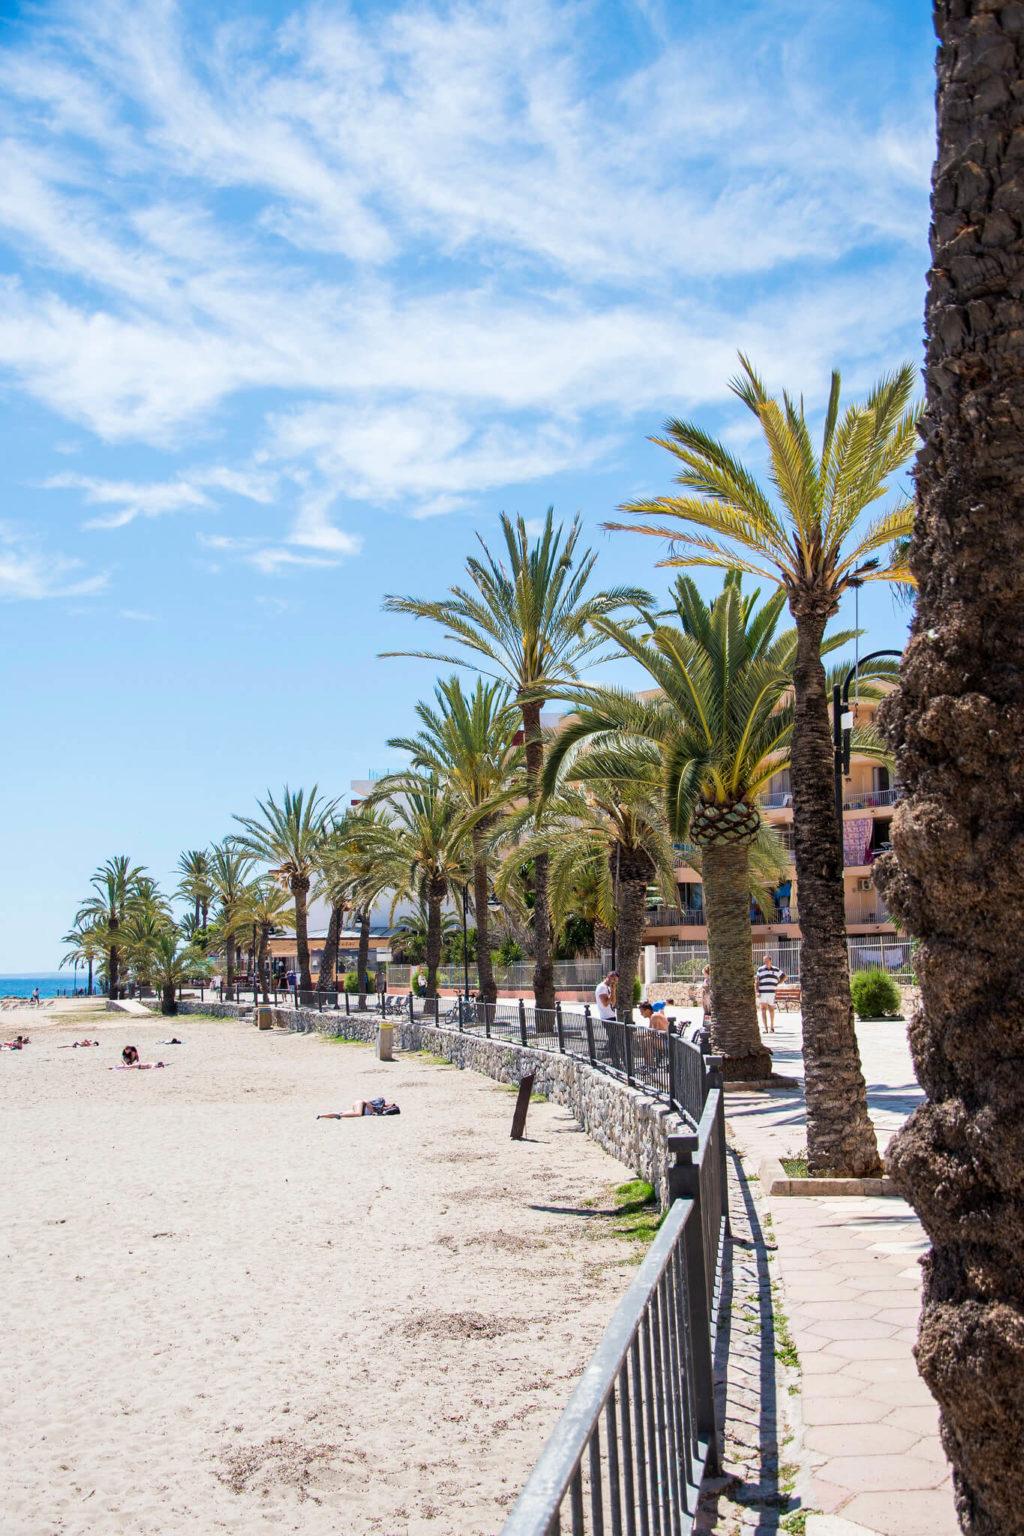 https://www.white-ibiza.com/wp-content/uploads/2020/03/ibiza-beaches-figueretas-05-1024x1536.jpg